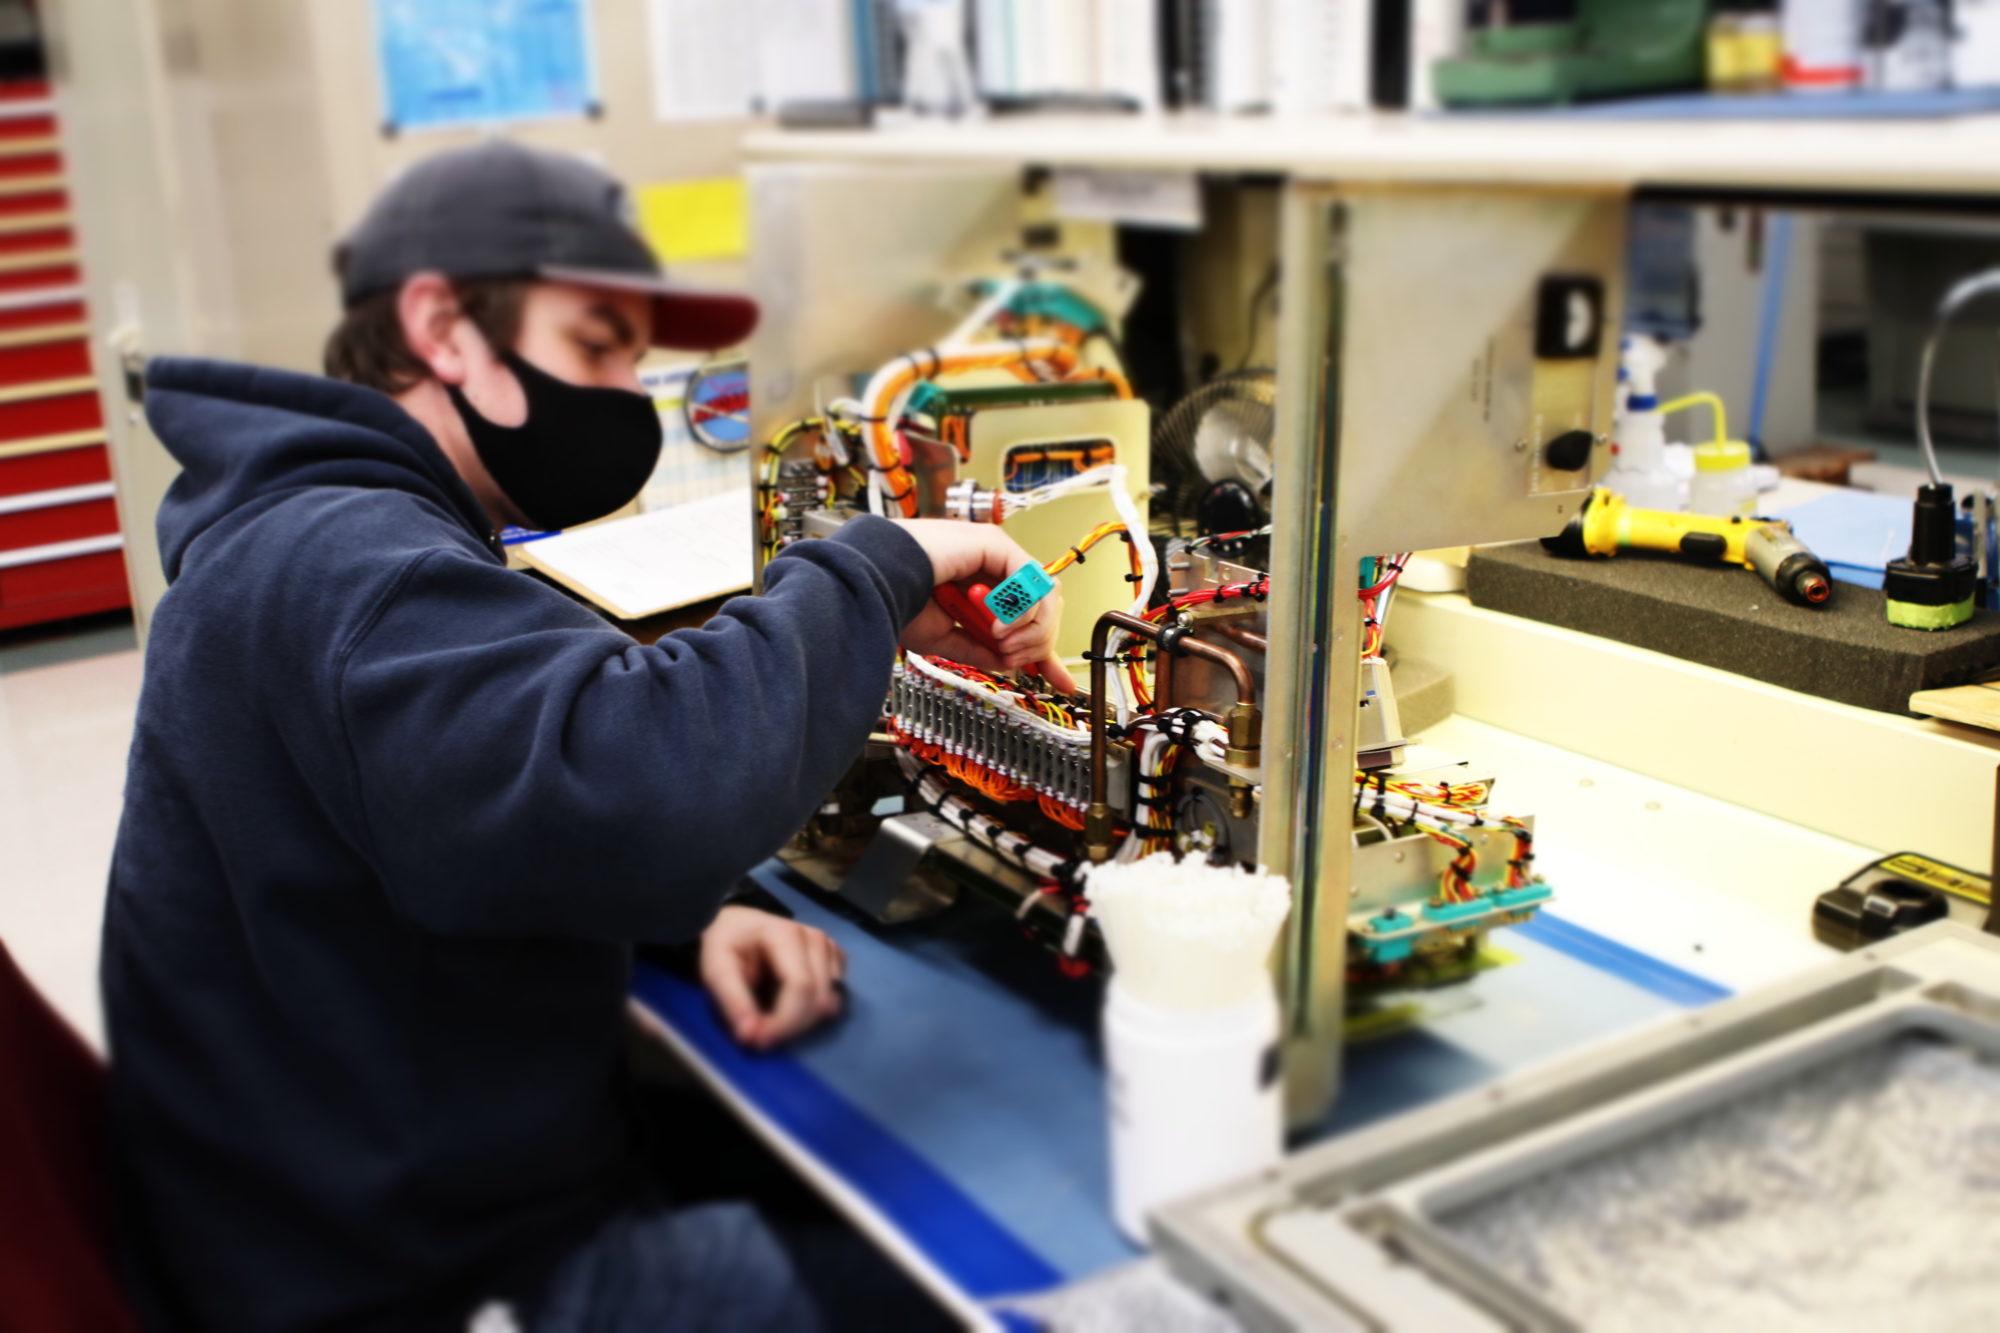 Amentum Model-Based Systems Engineering (MBSE) laboratory and digital engineering toolsets